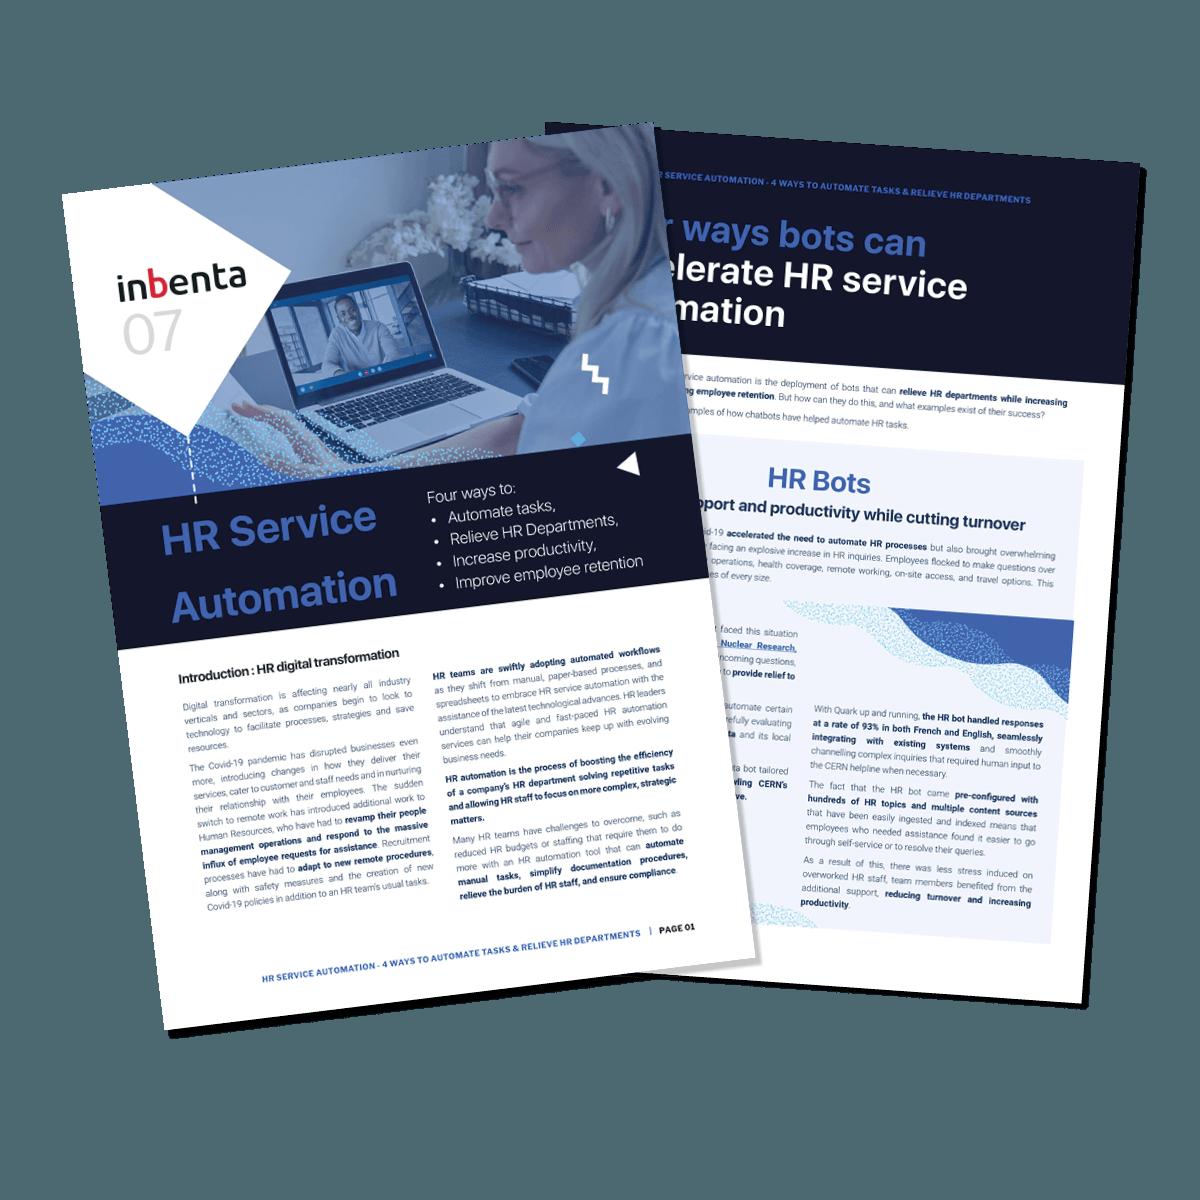 HR Service Automation